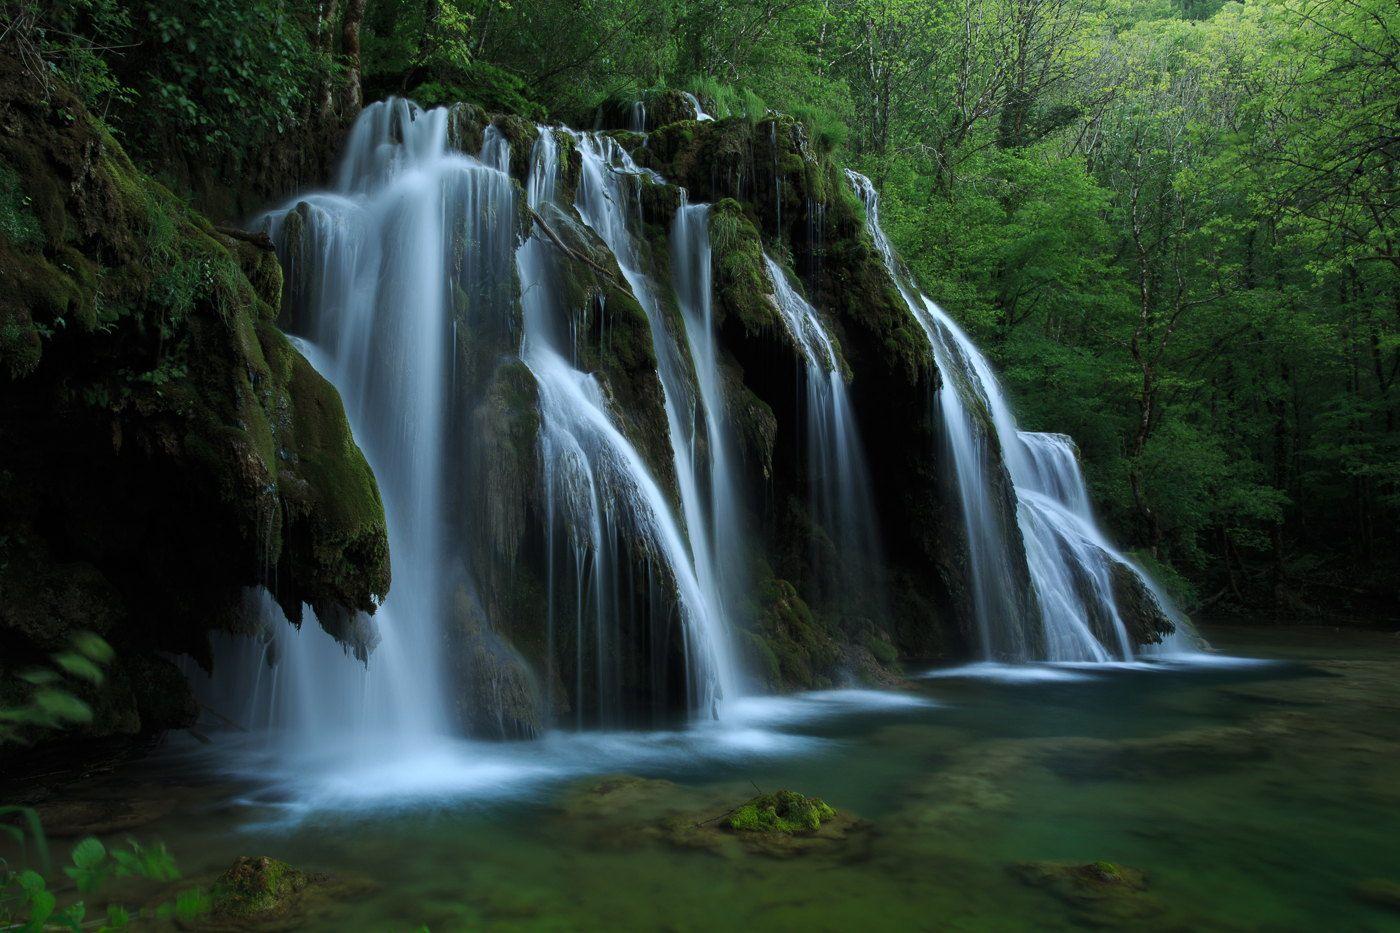 Jura Region In France Beautiful Waterfalls Waterfall Places To Visit